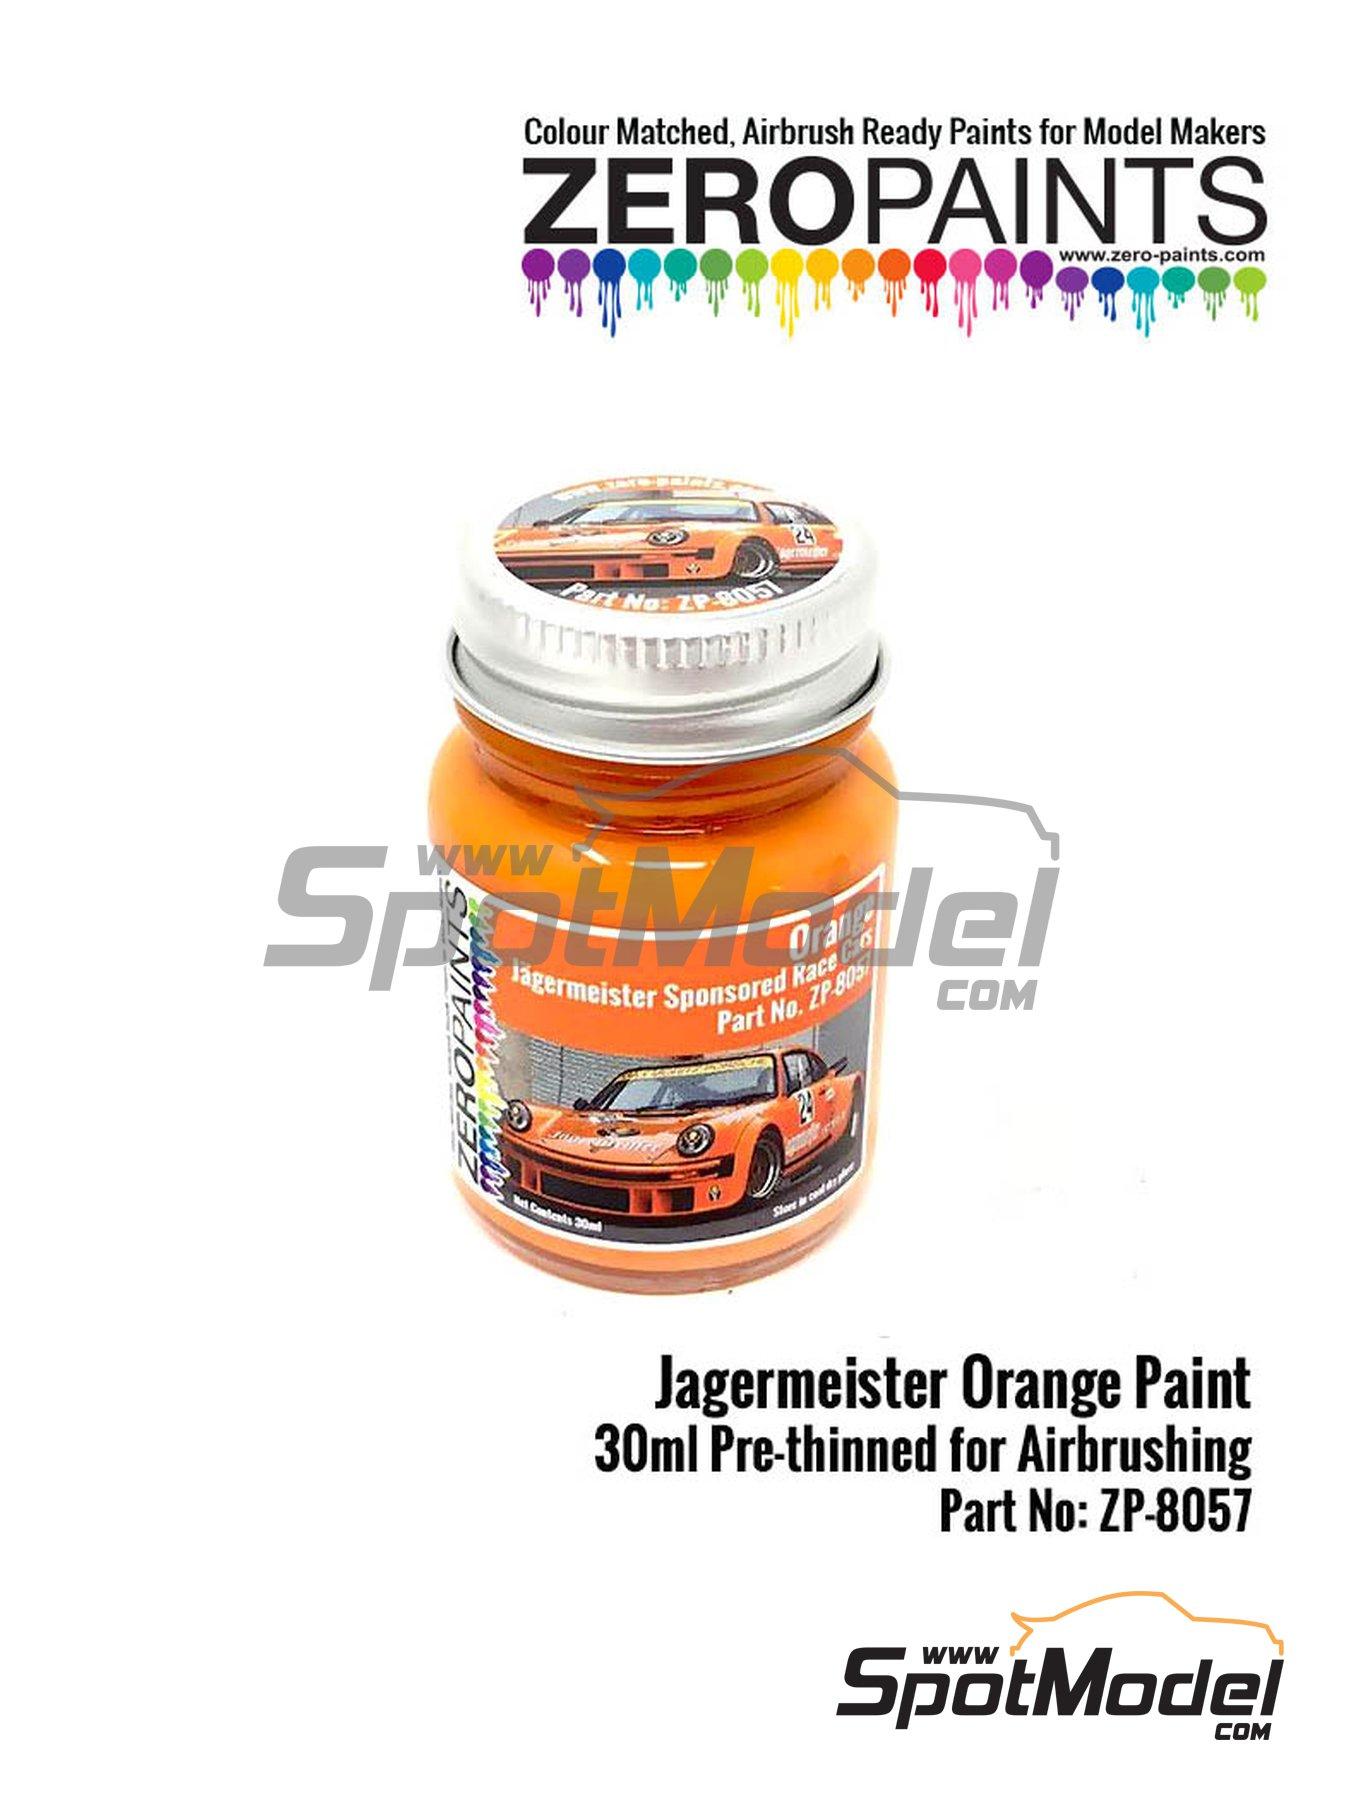 Naranja Jagermeister Orange - 1 x 30ml | Pintura fabricado por Zero Paints (ref.ZP-8057) image